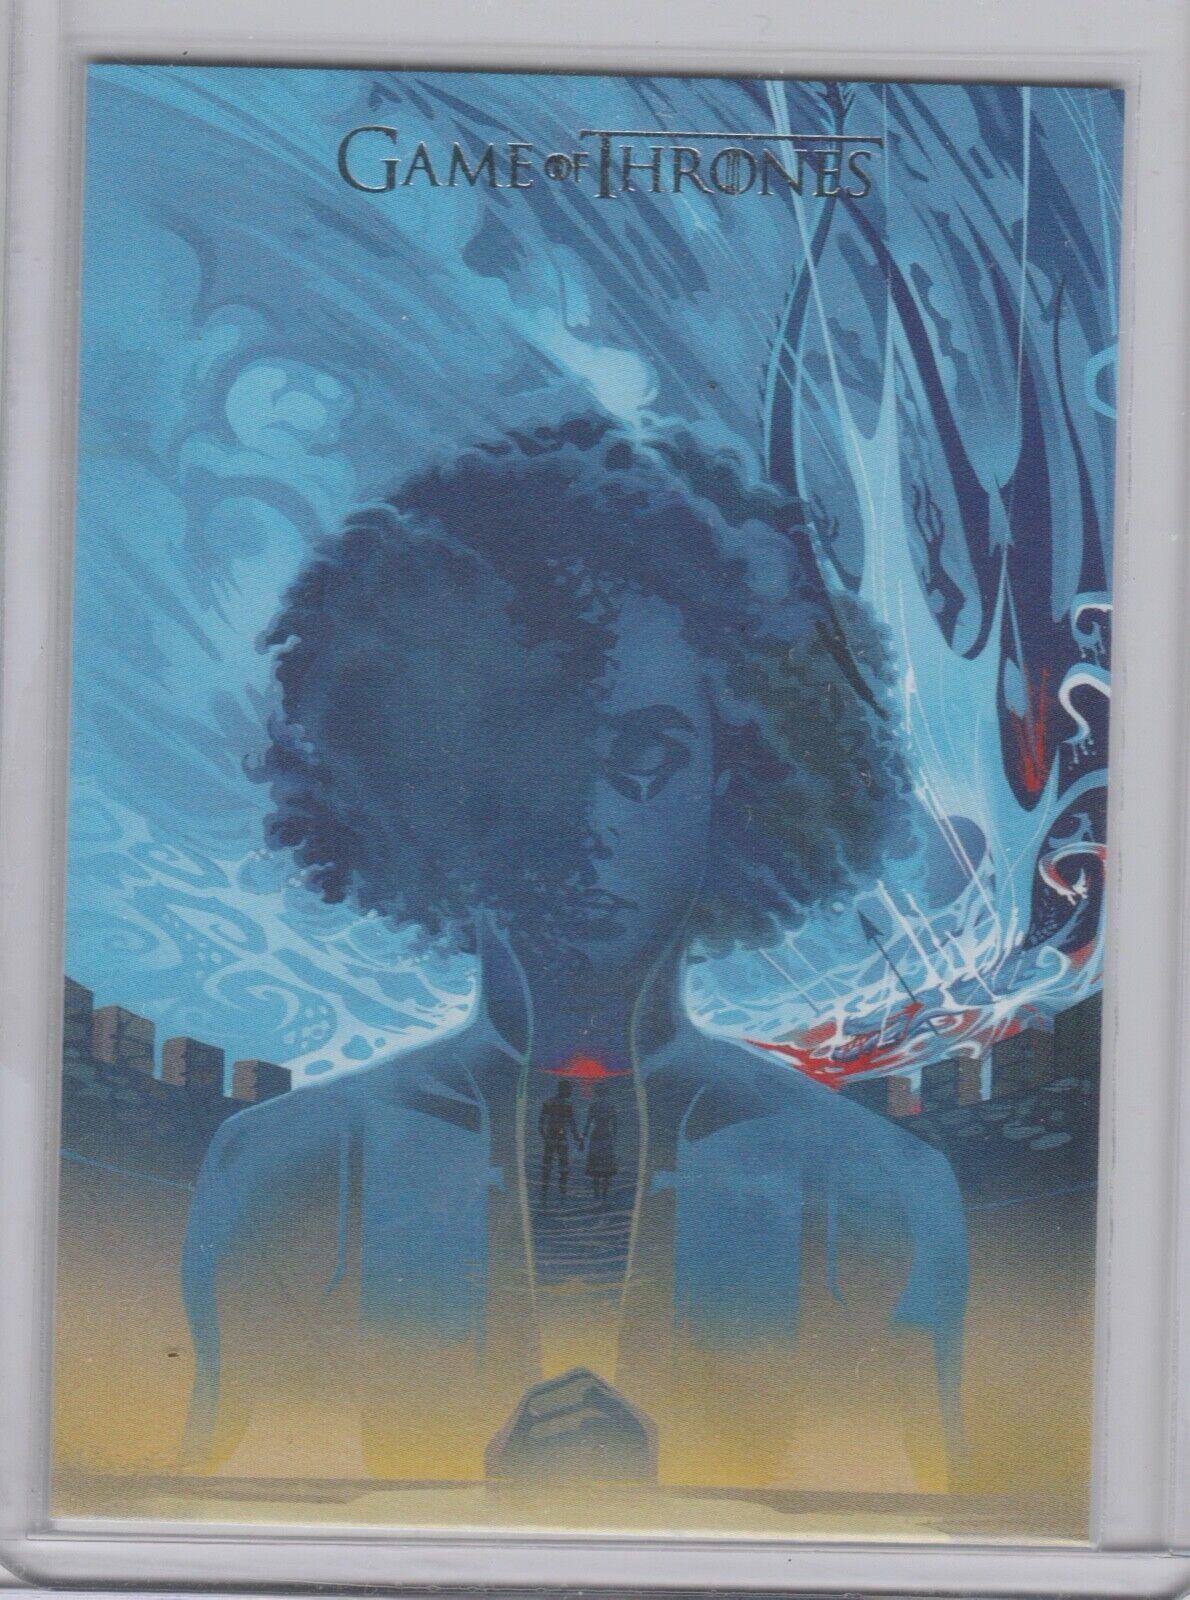 2020 Game Of Thrones Season 8 Beautiful Death Poster Art BD71 -- Rare 1 72 Packs - $2.99